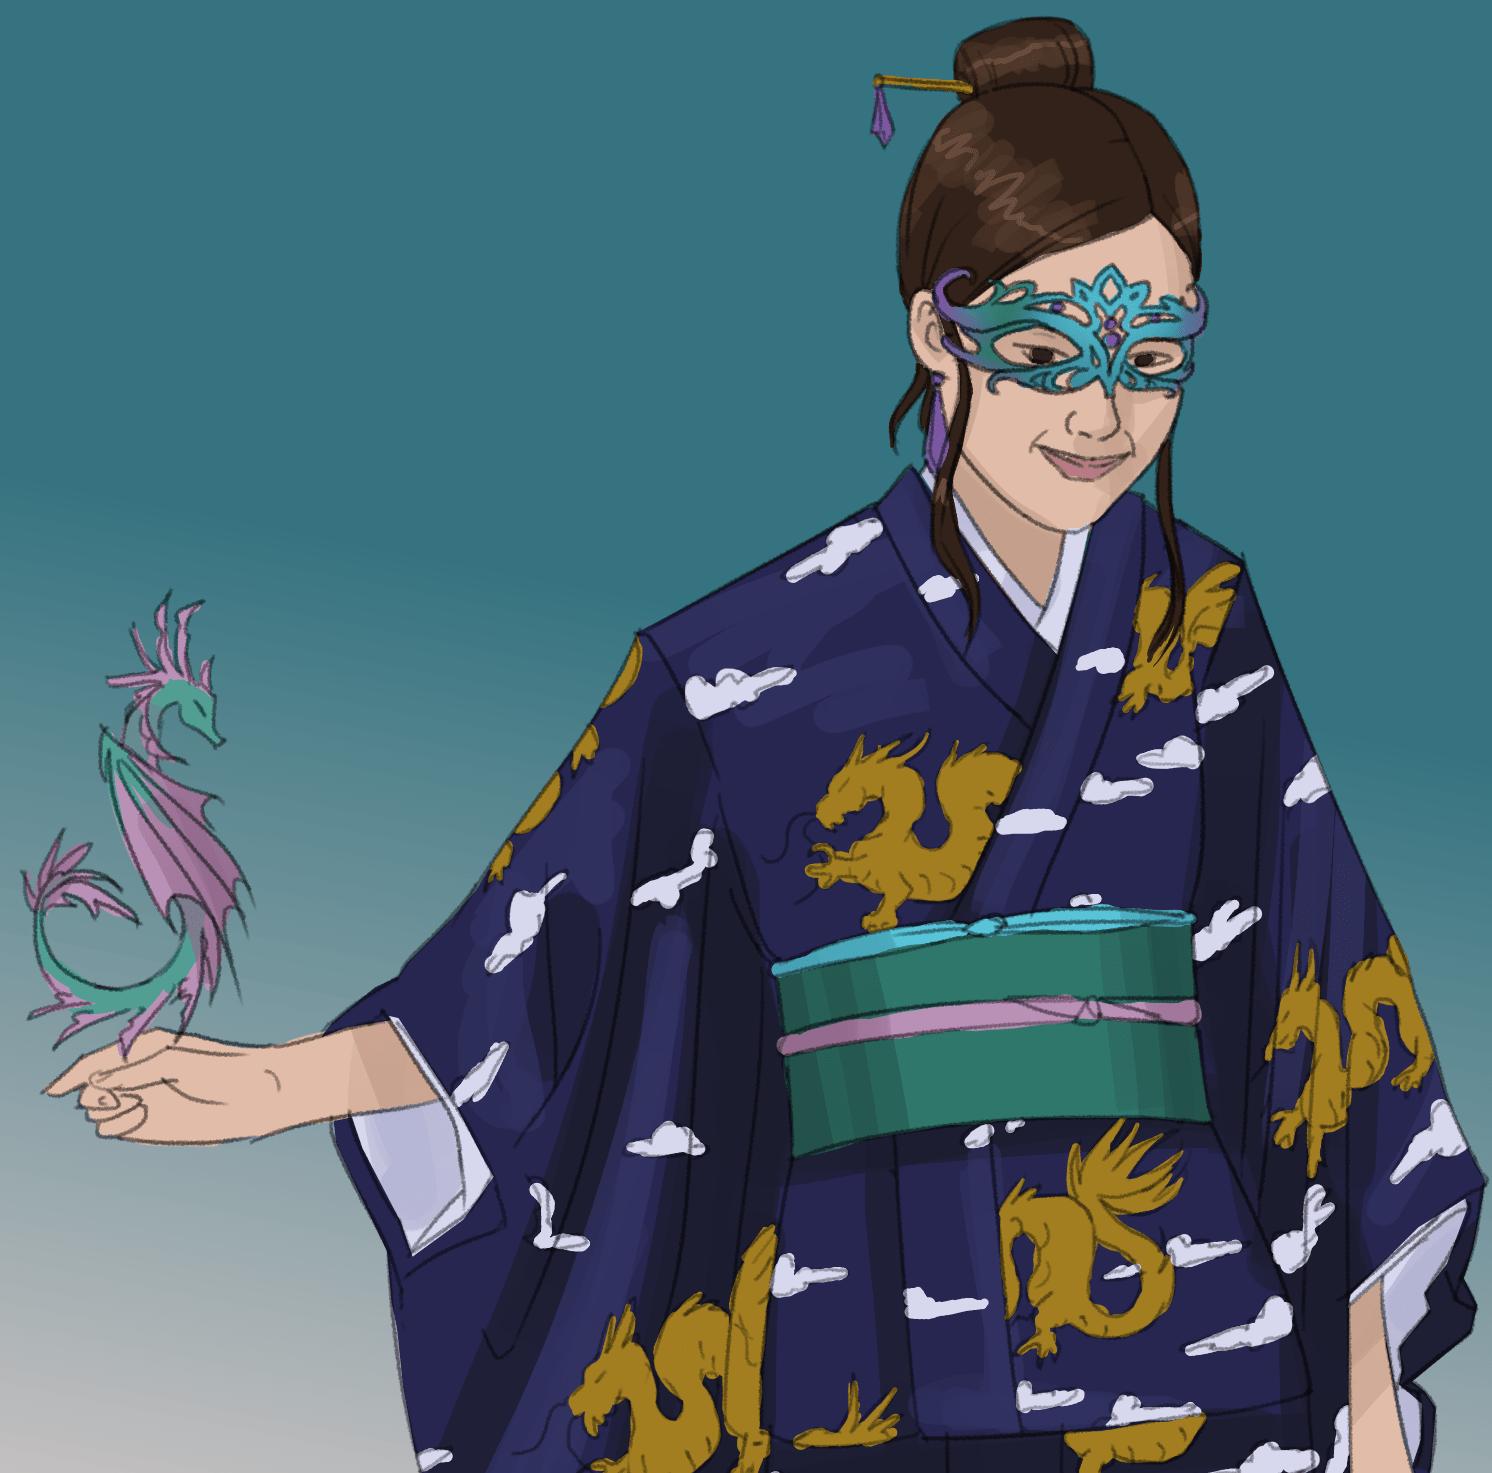 Ryujin's Mask